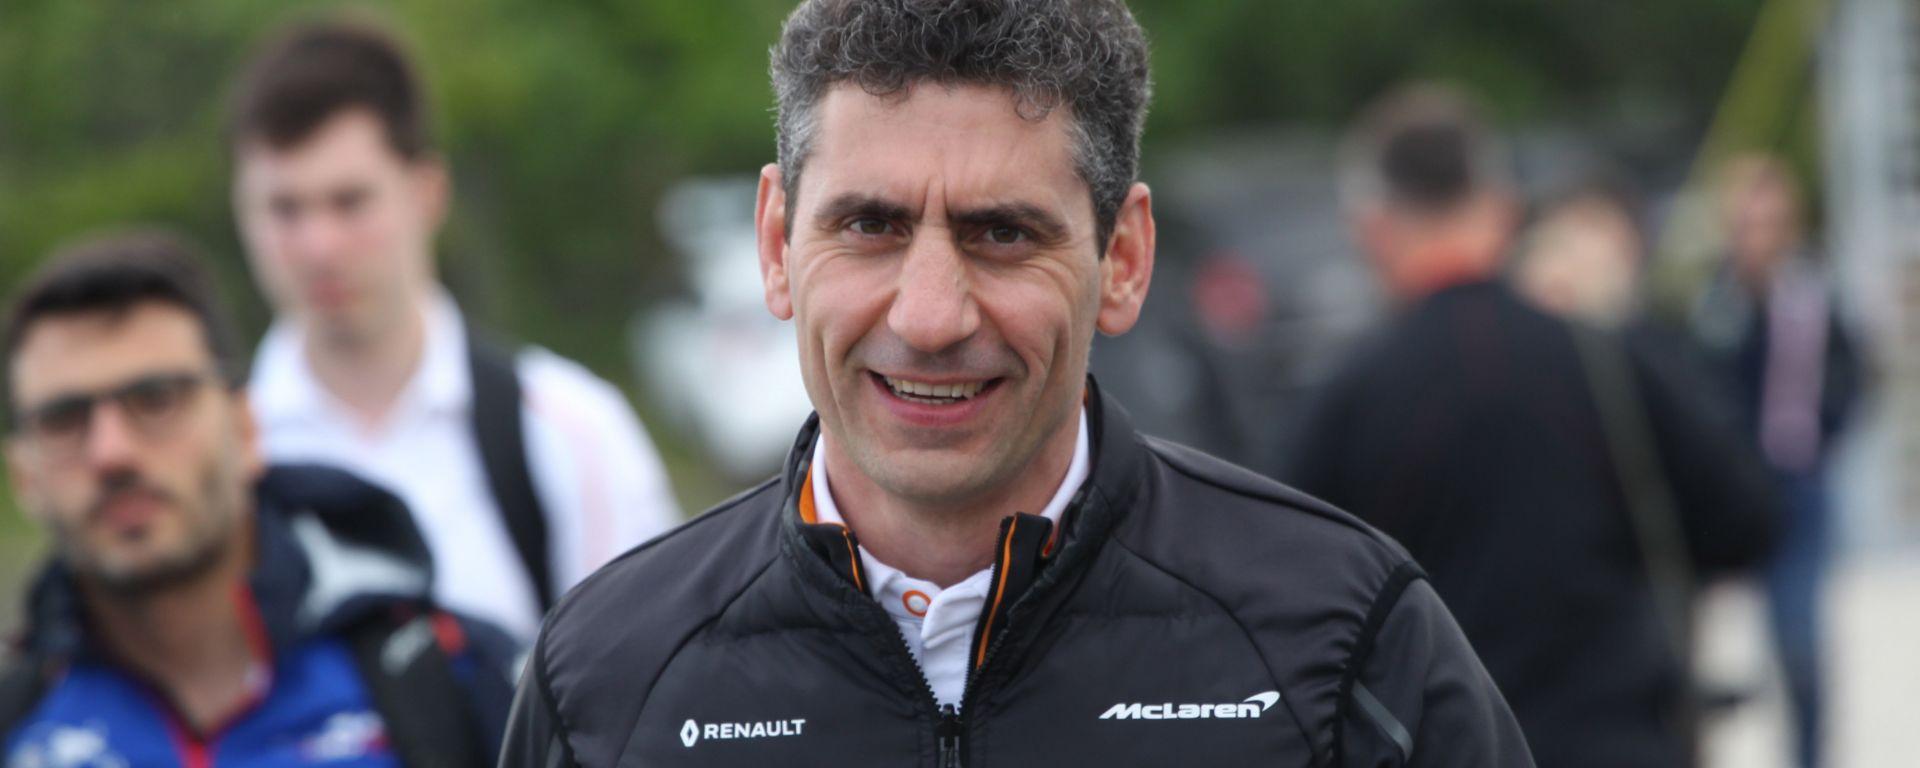 F1: Andrea Stella, Racing director della McLaren